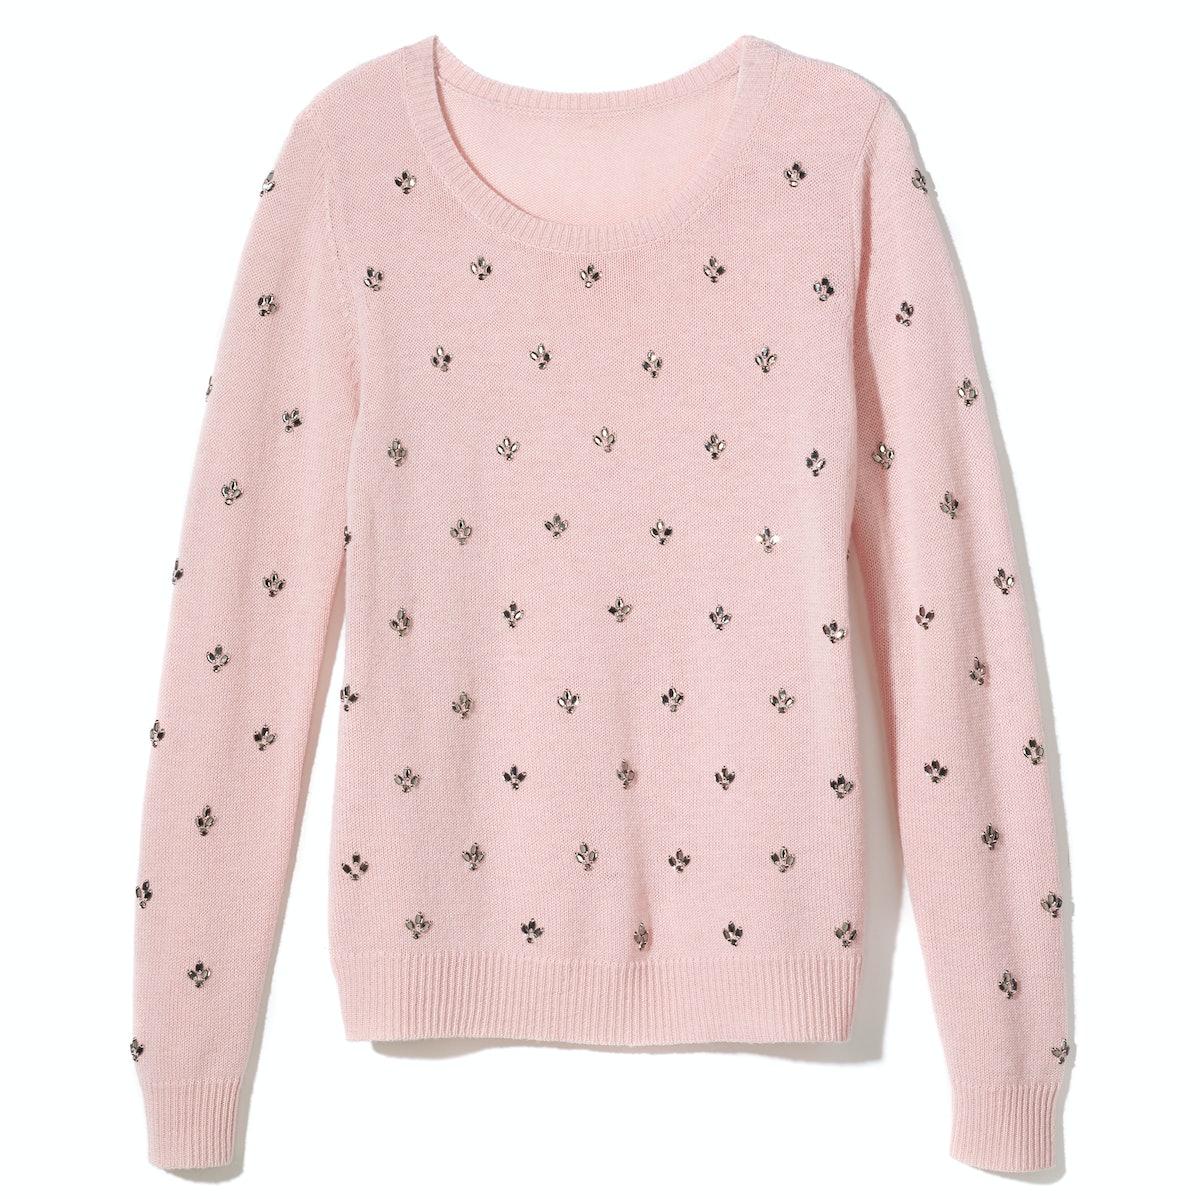 Joie sweater